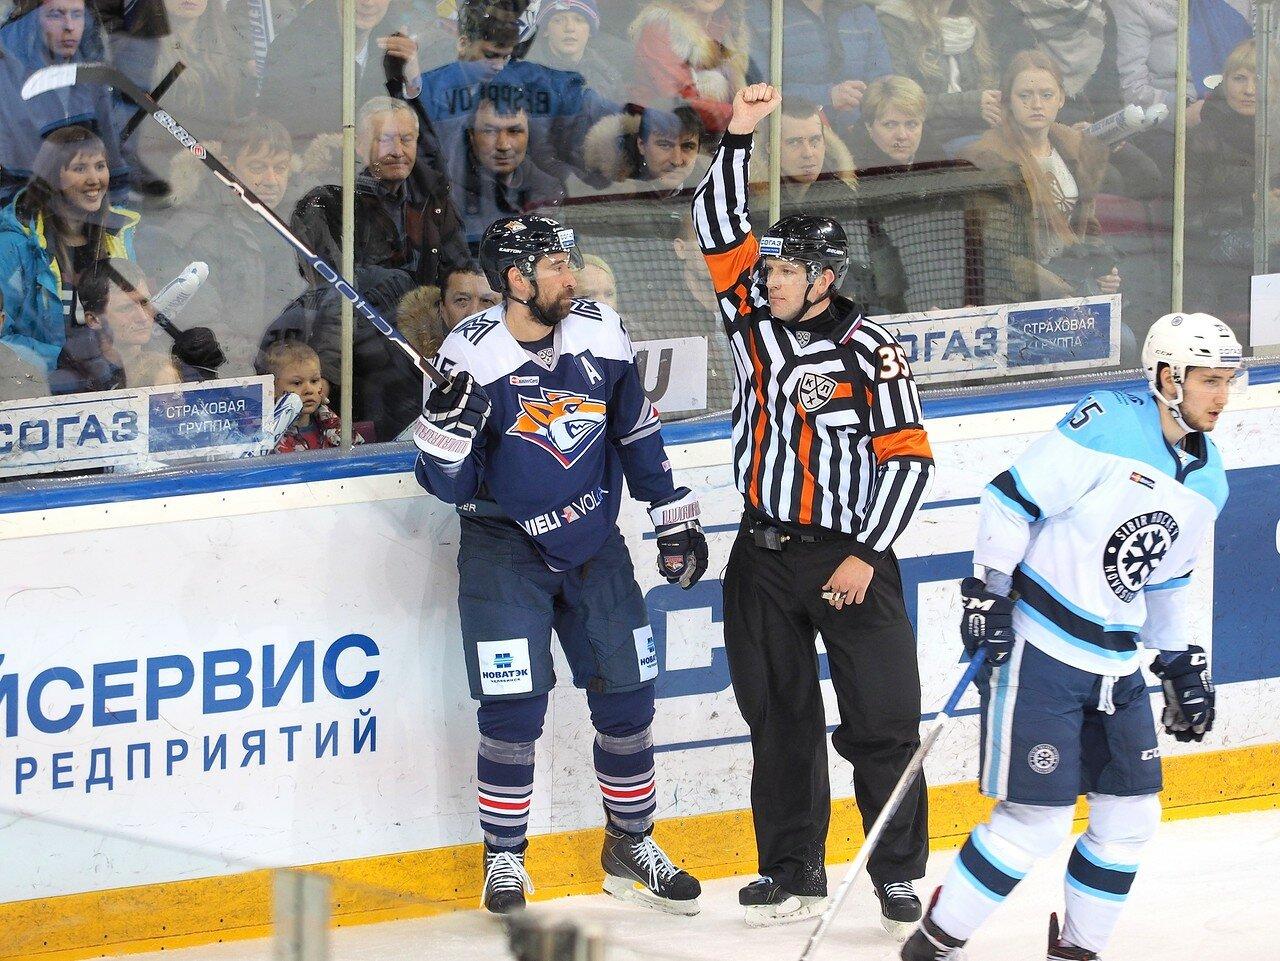 56Плей-офф 2016 Восток 1/2 Металлург - Сибирь 16.03.2016